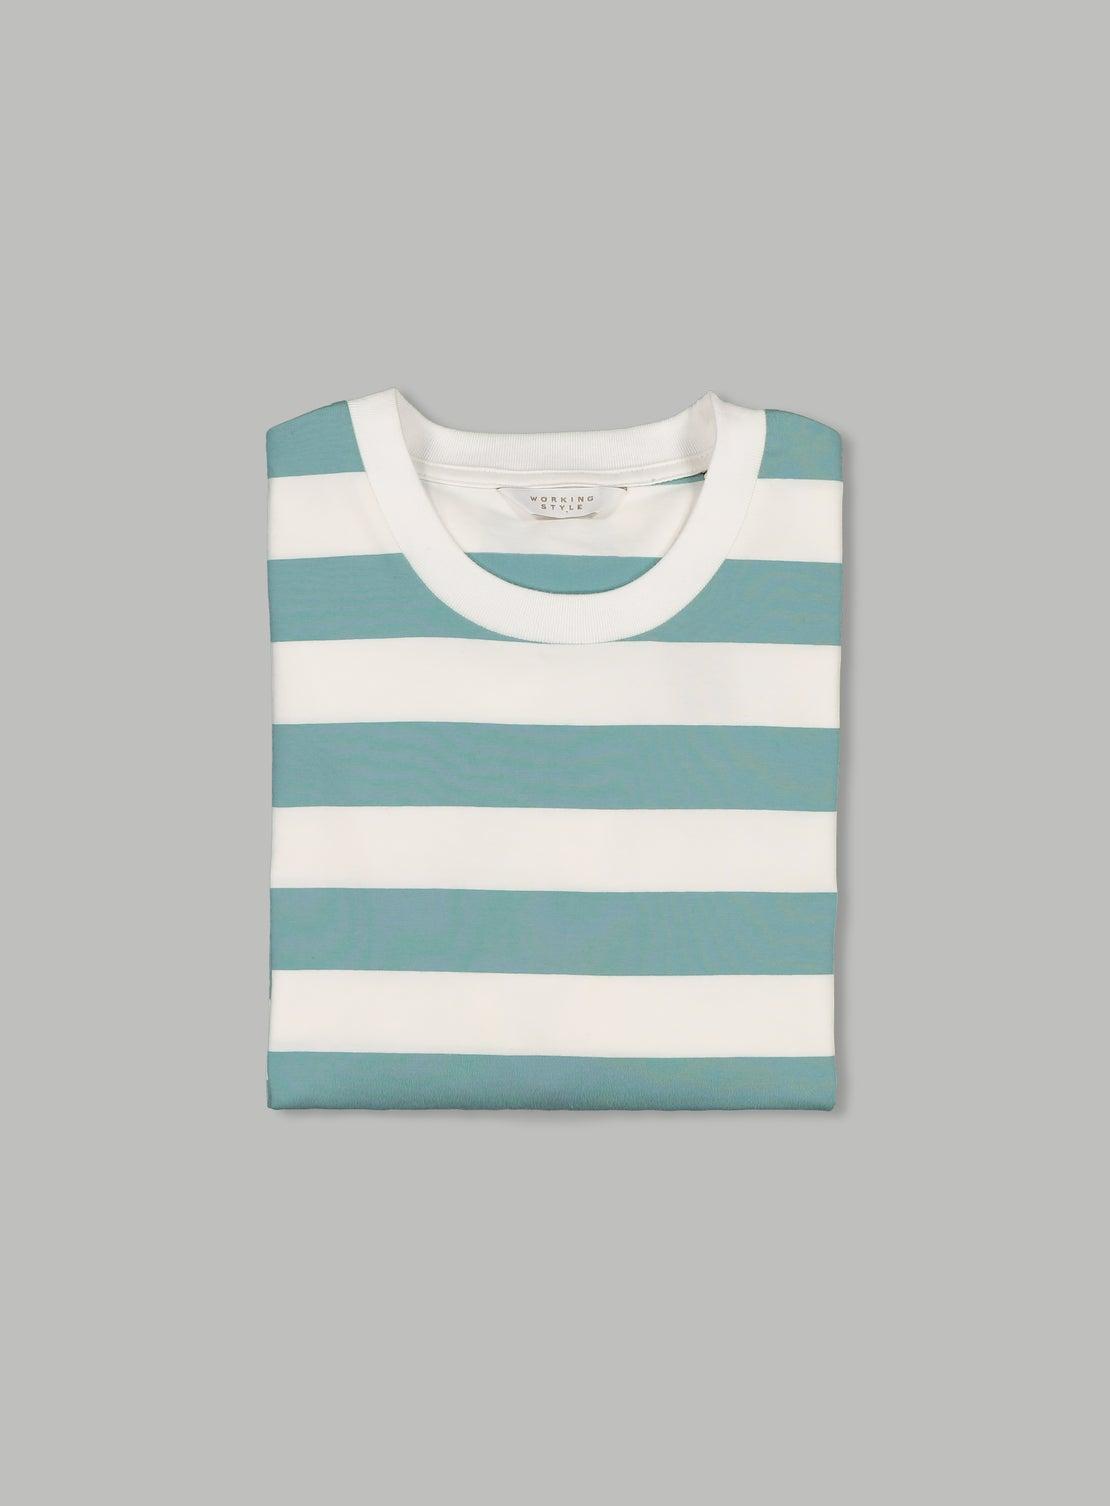 Donny Teal & White Wide Stripe T-Shirt